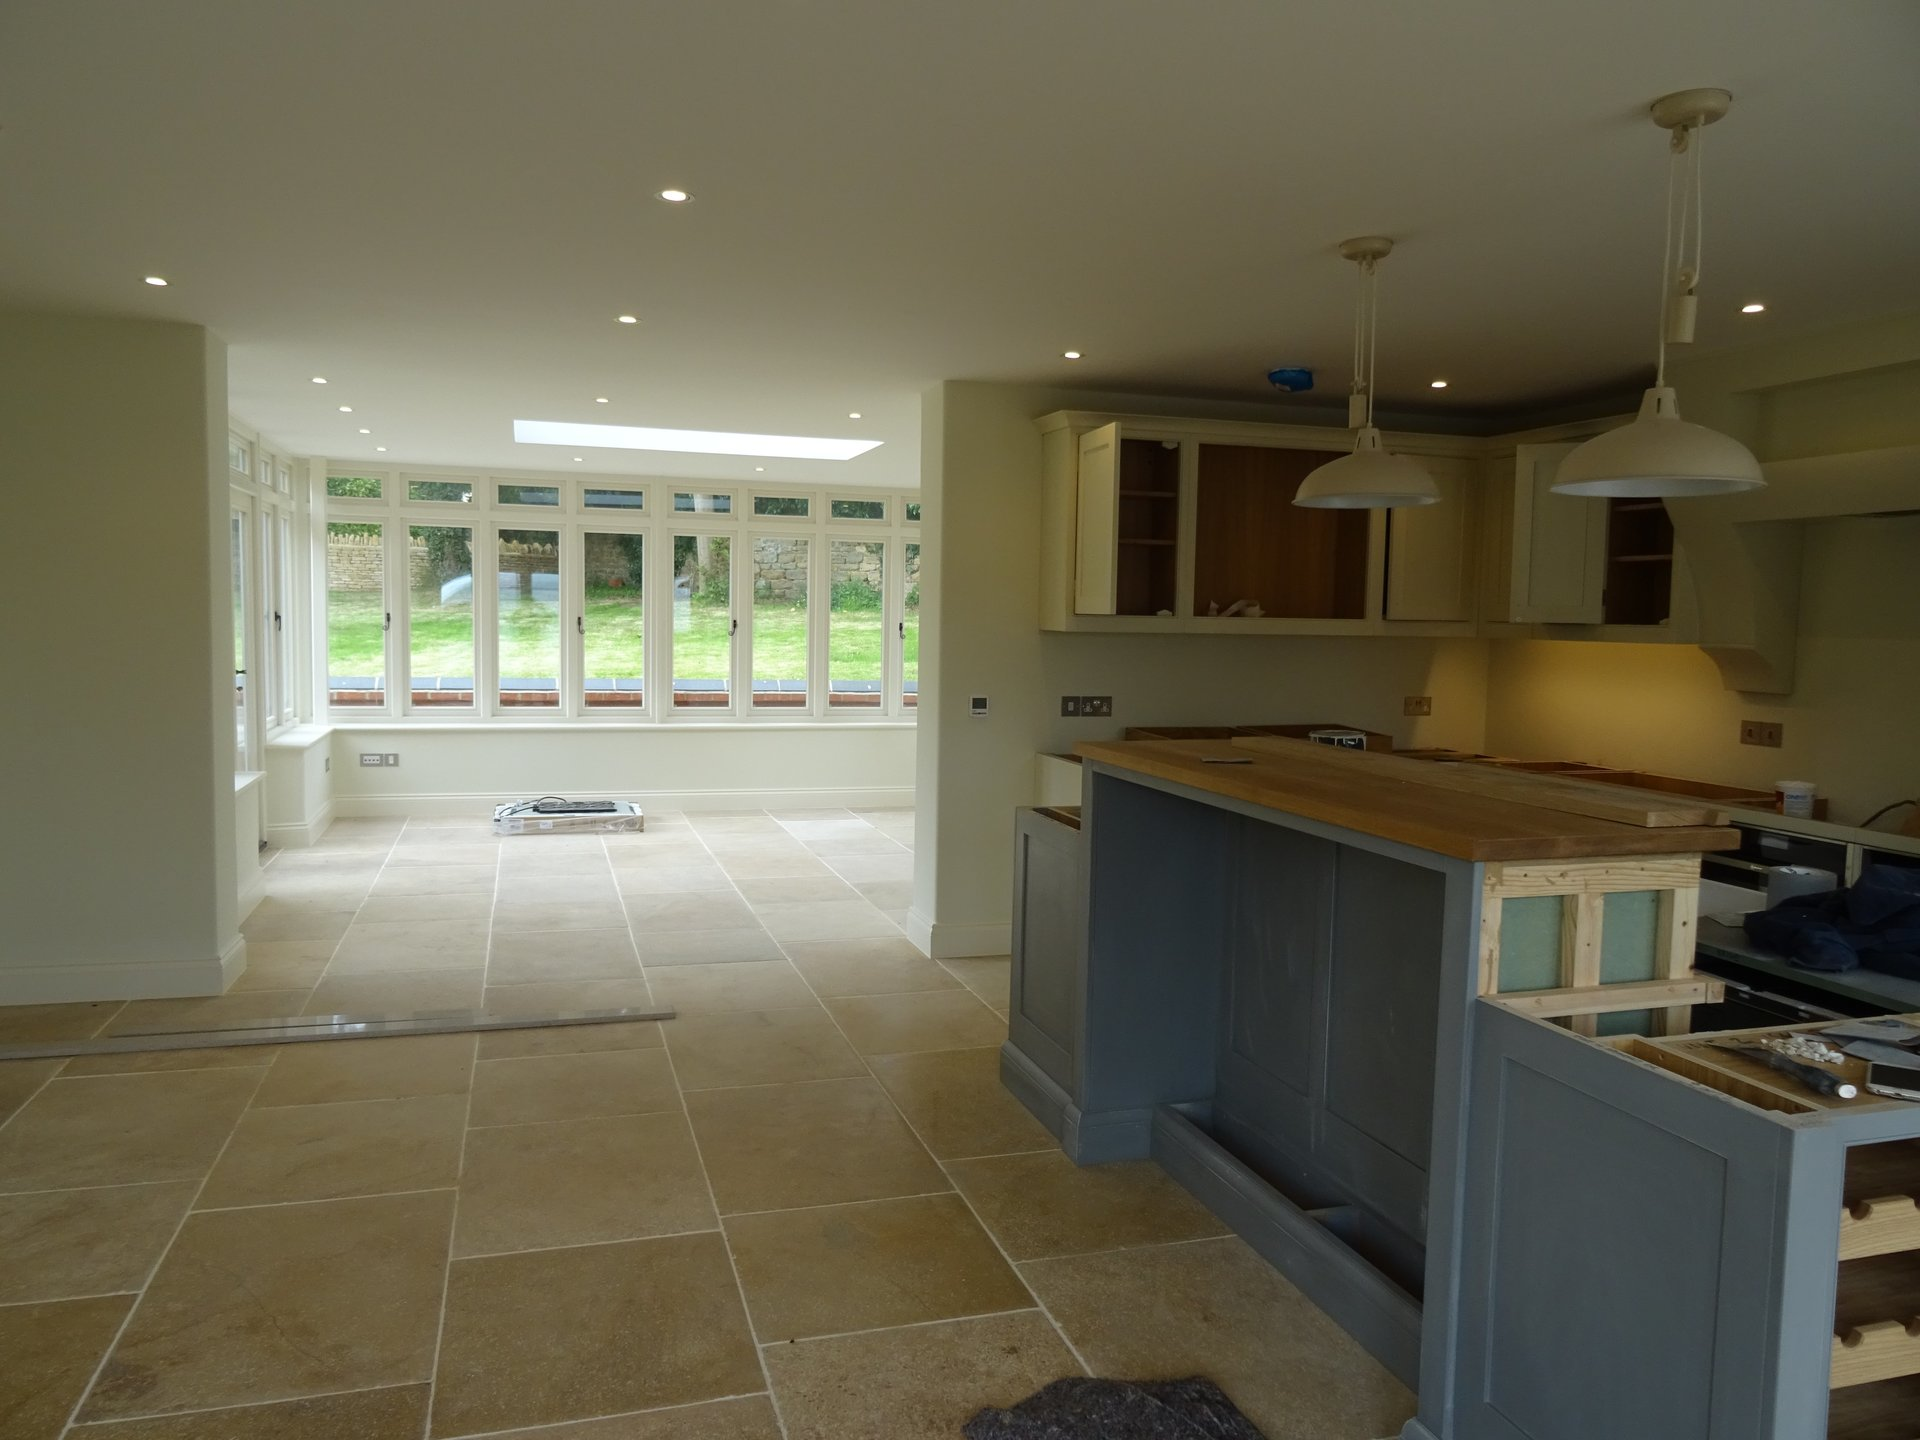 ventilated kitchen